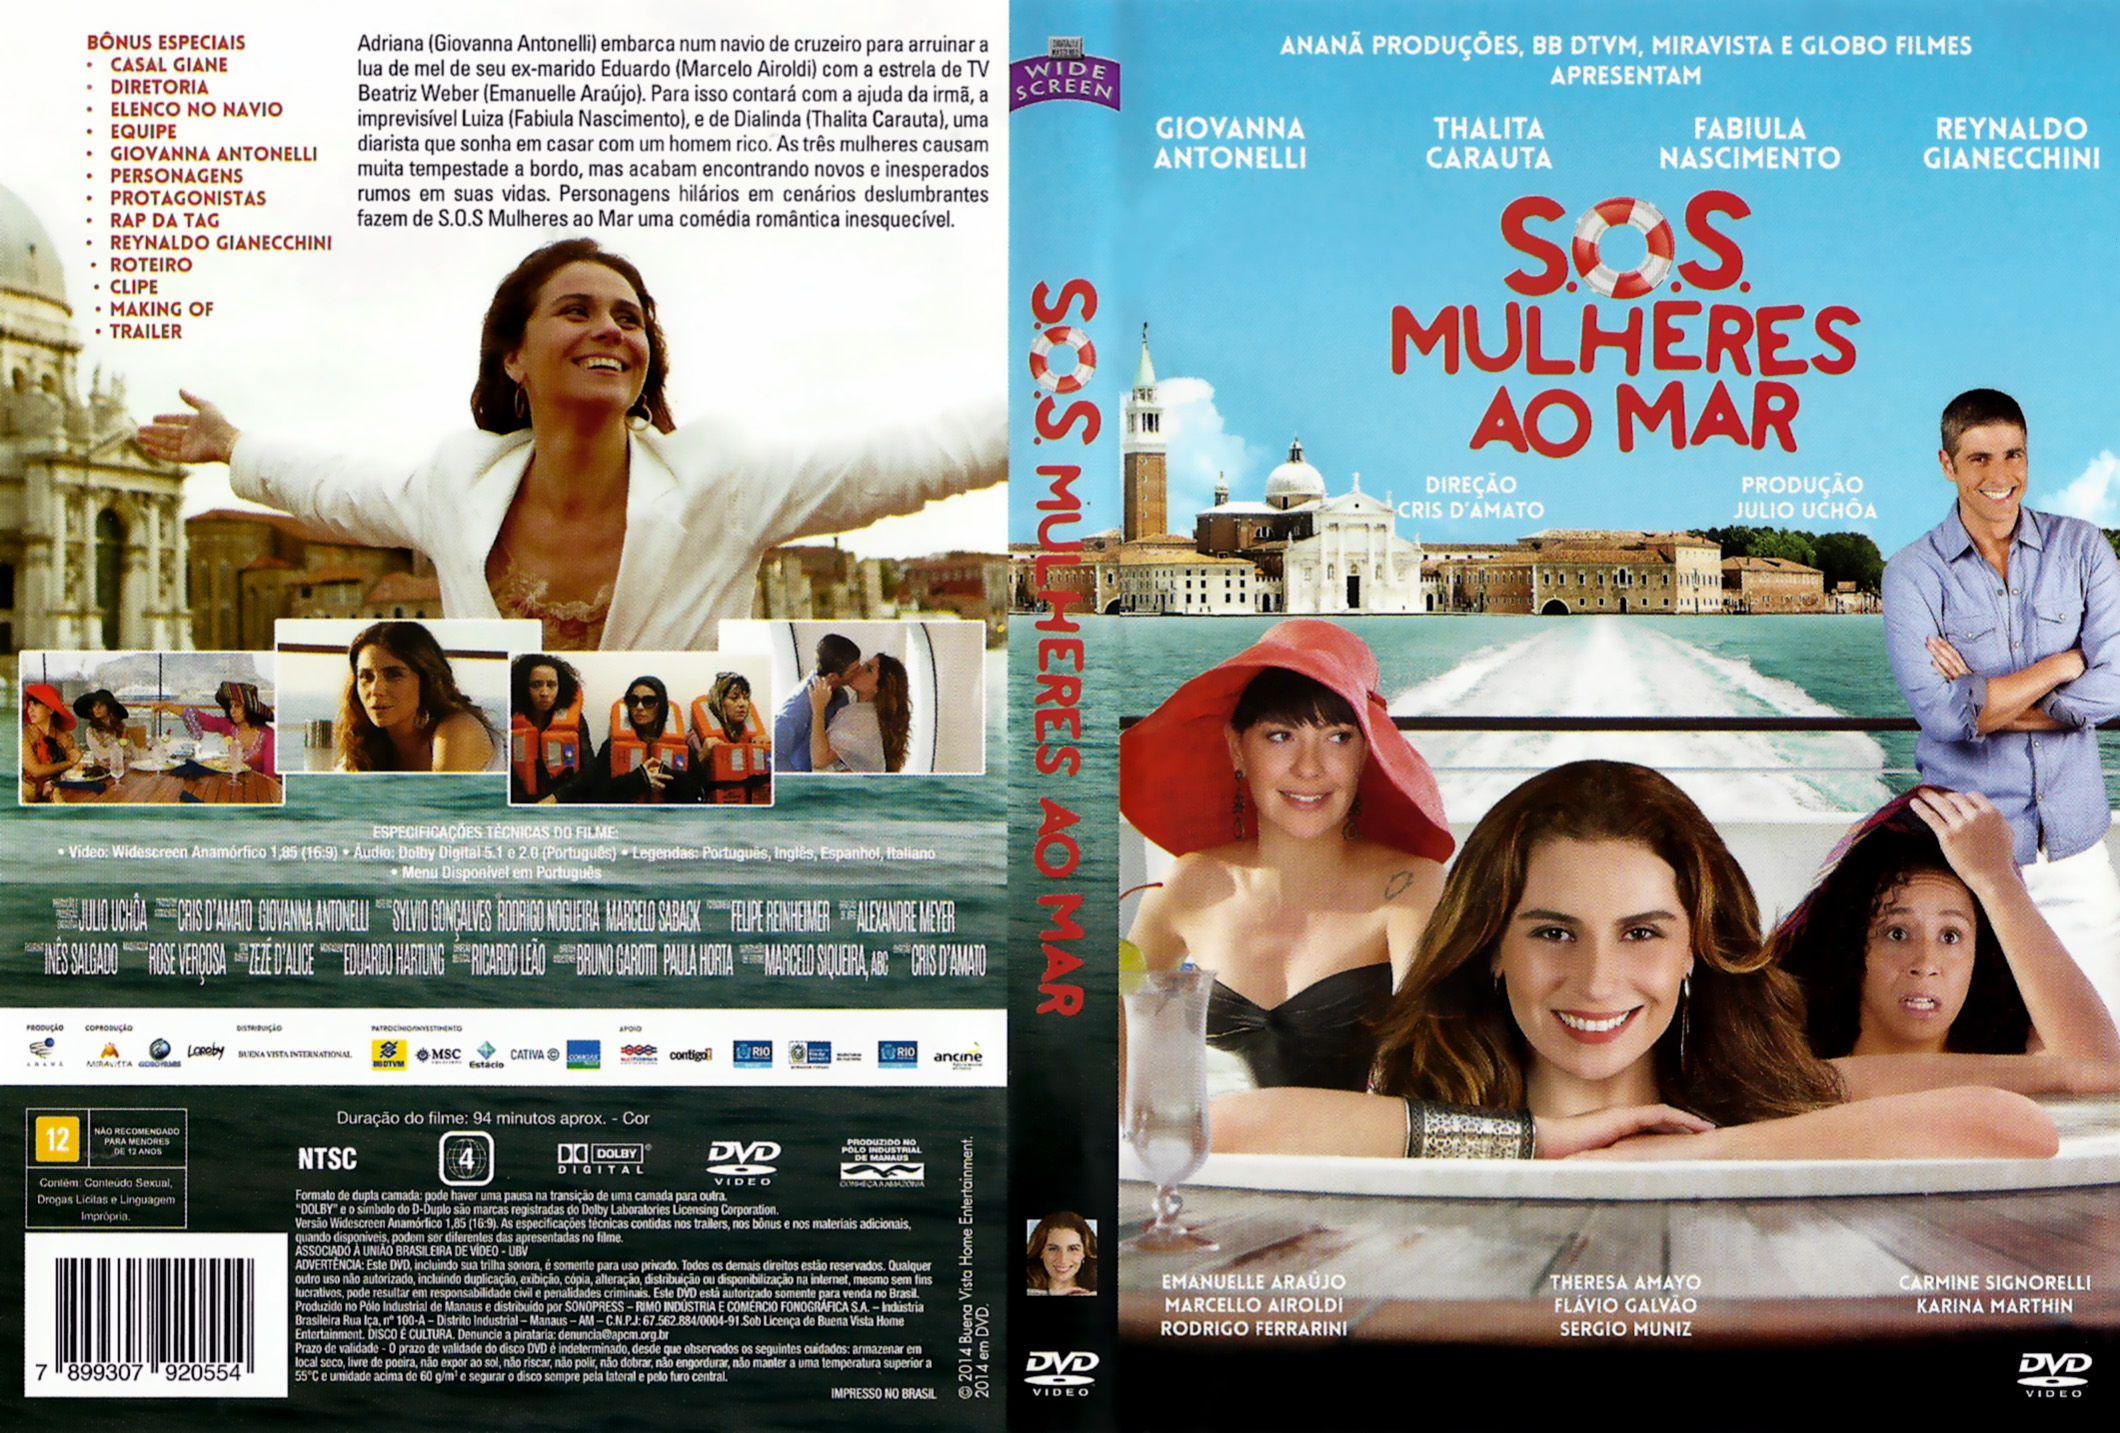 Capa DVD S.O.S Mulheres Ao Mar